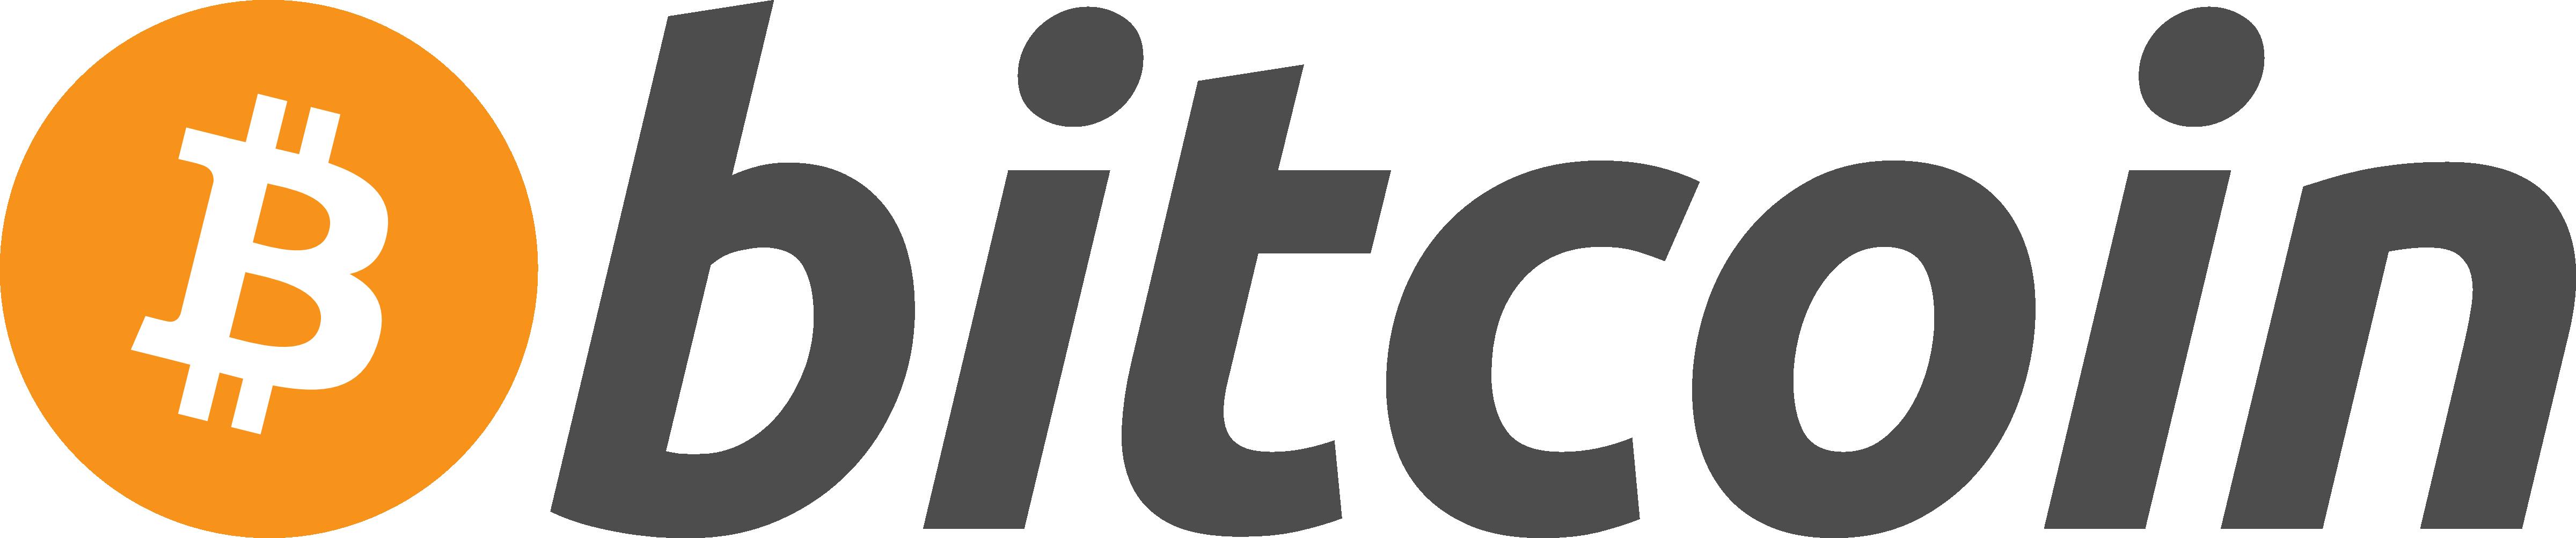 Kryptovalutor - Bitcoin